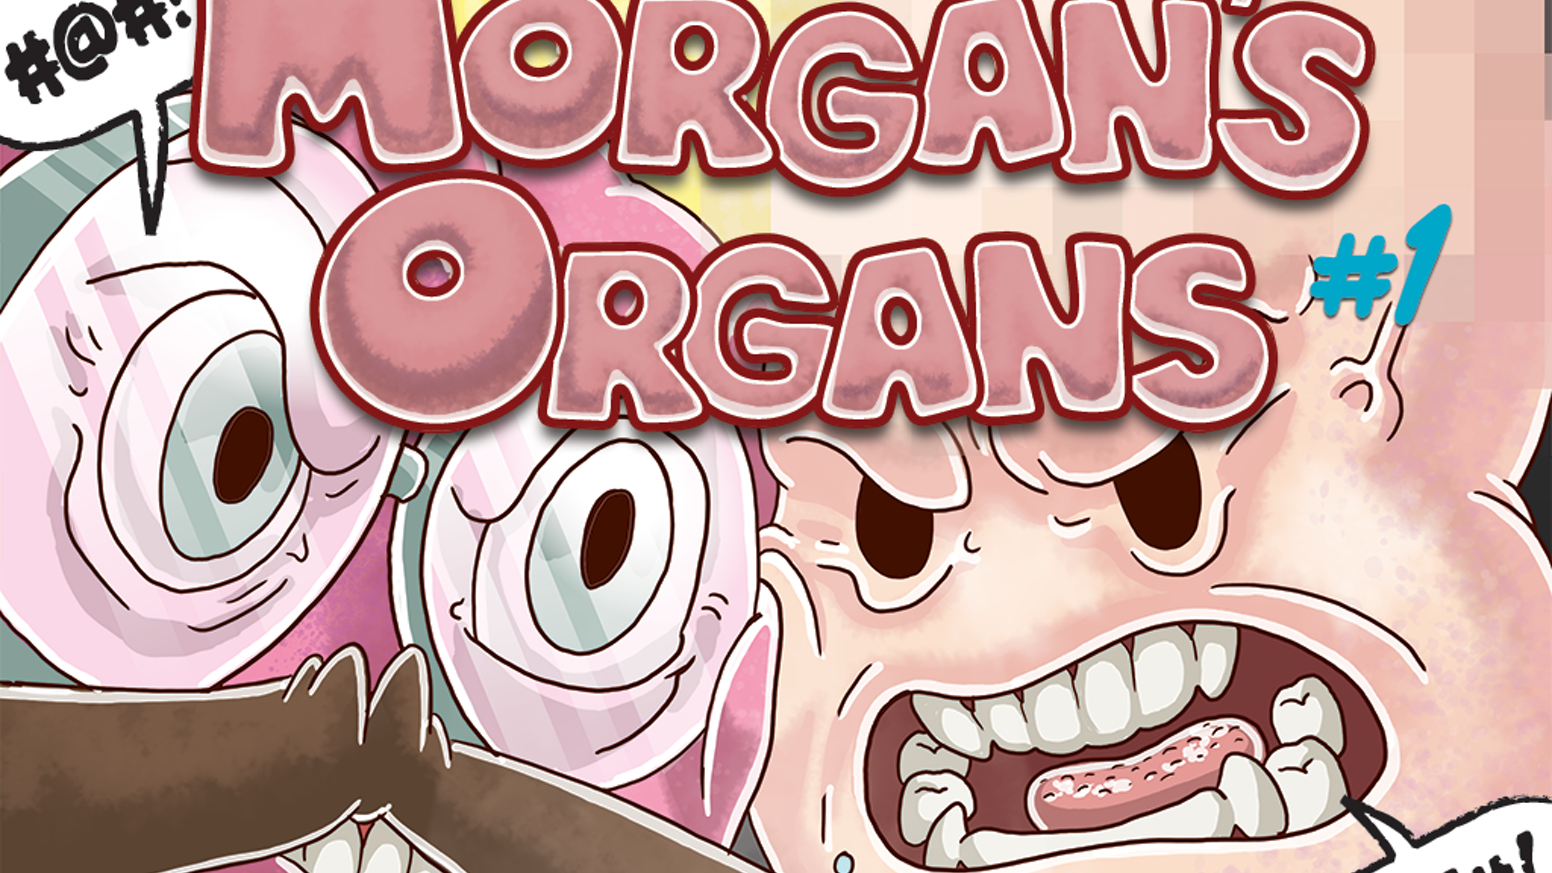 morgan s organs 1 a comic book inside our insides by daniel